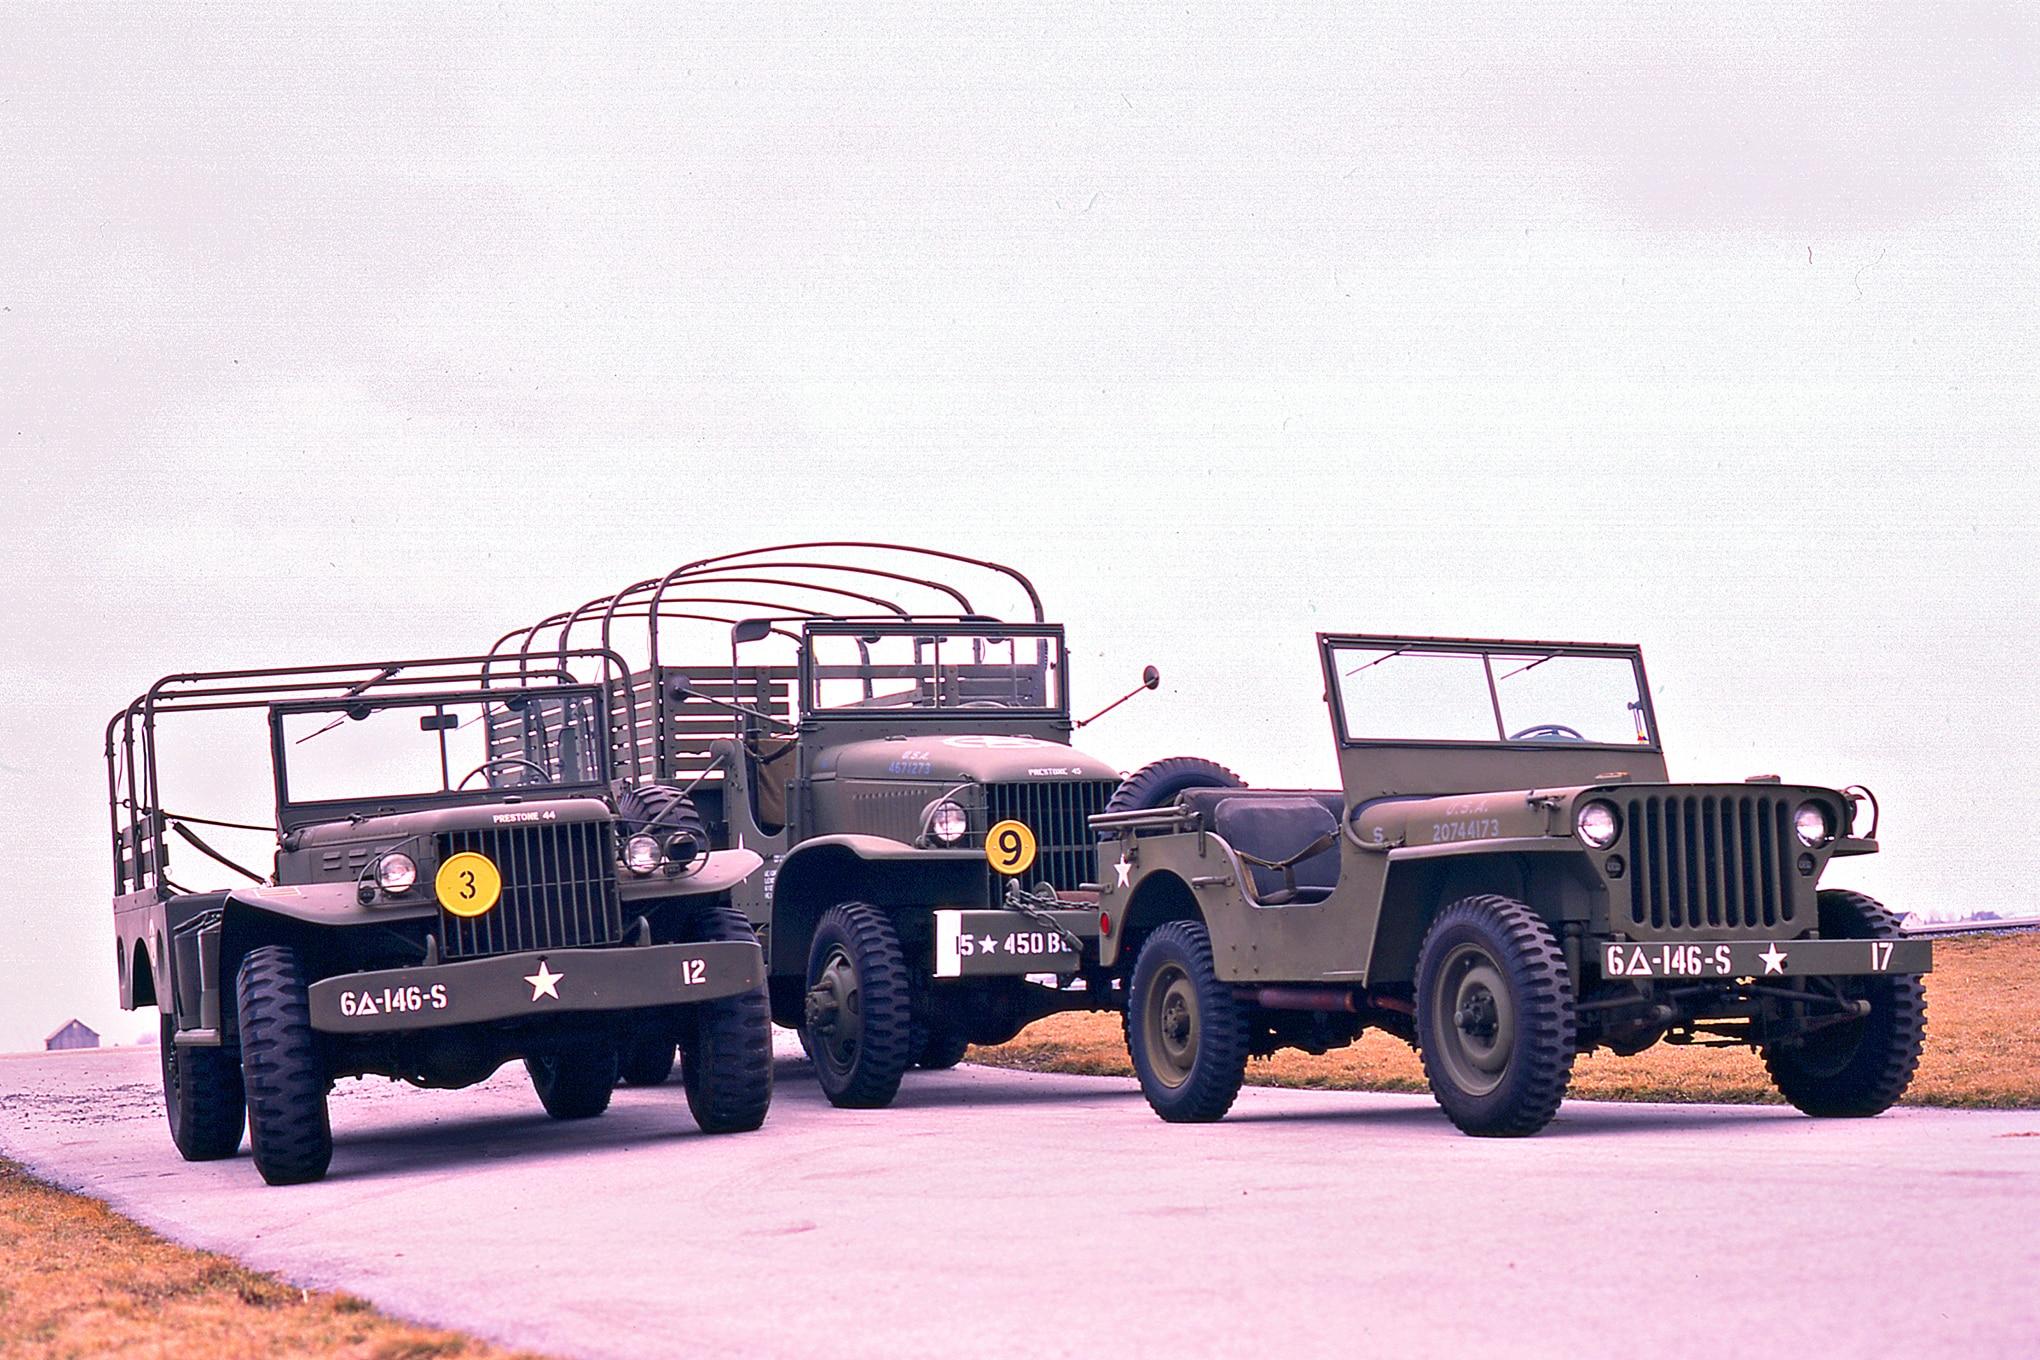 001 WWII heroes jeep dodge gmc group